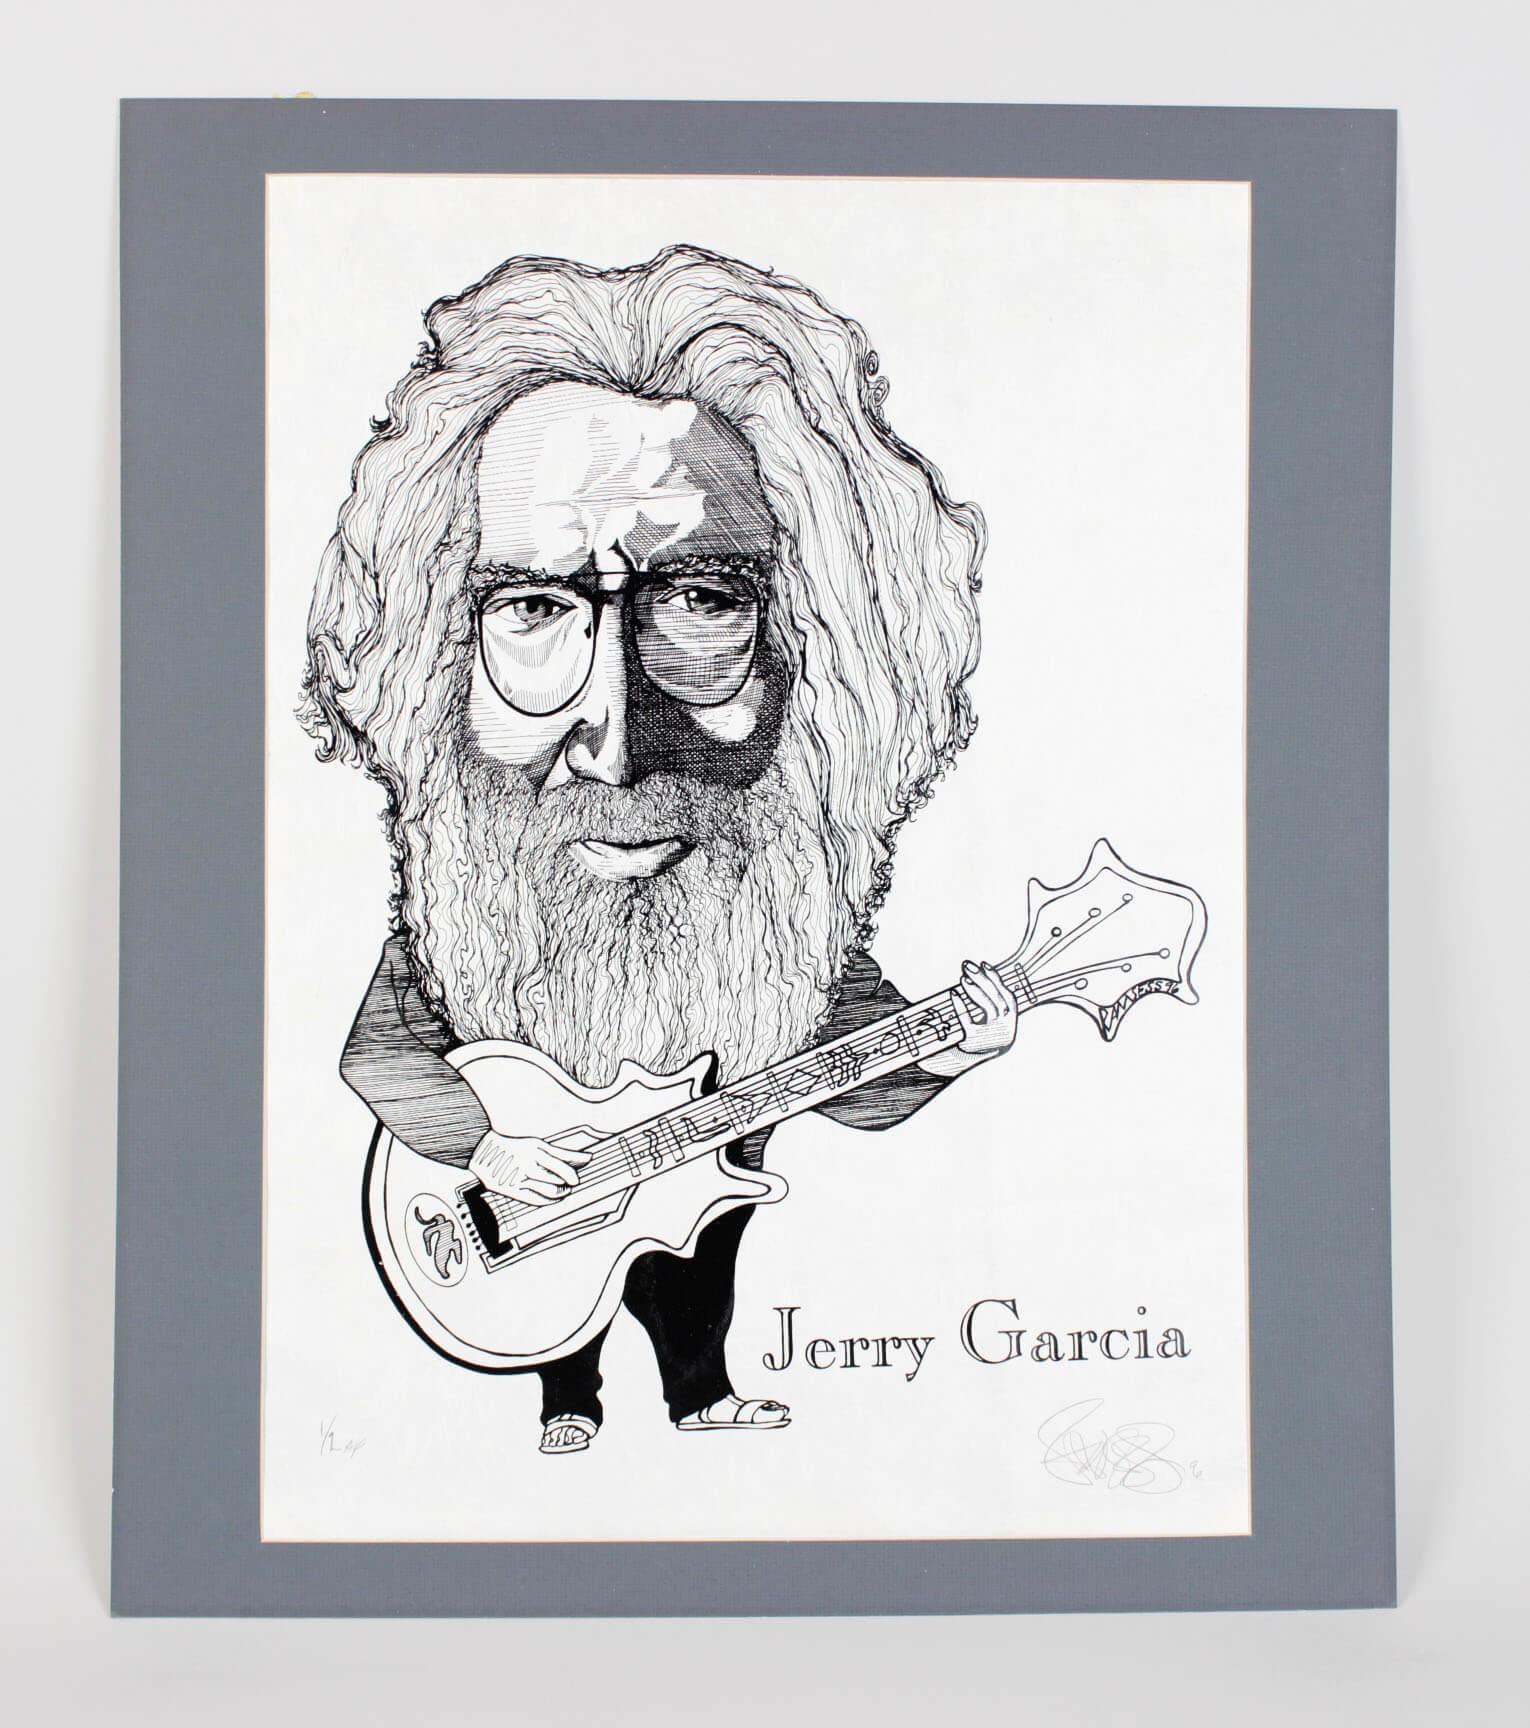 Grateful Dead - Jerry Garcia 18x24 Artist Proof Print Signed by Artist Ramsess 1/2 AP